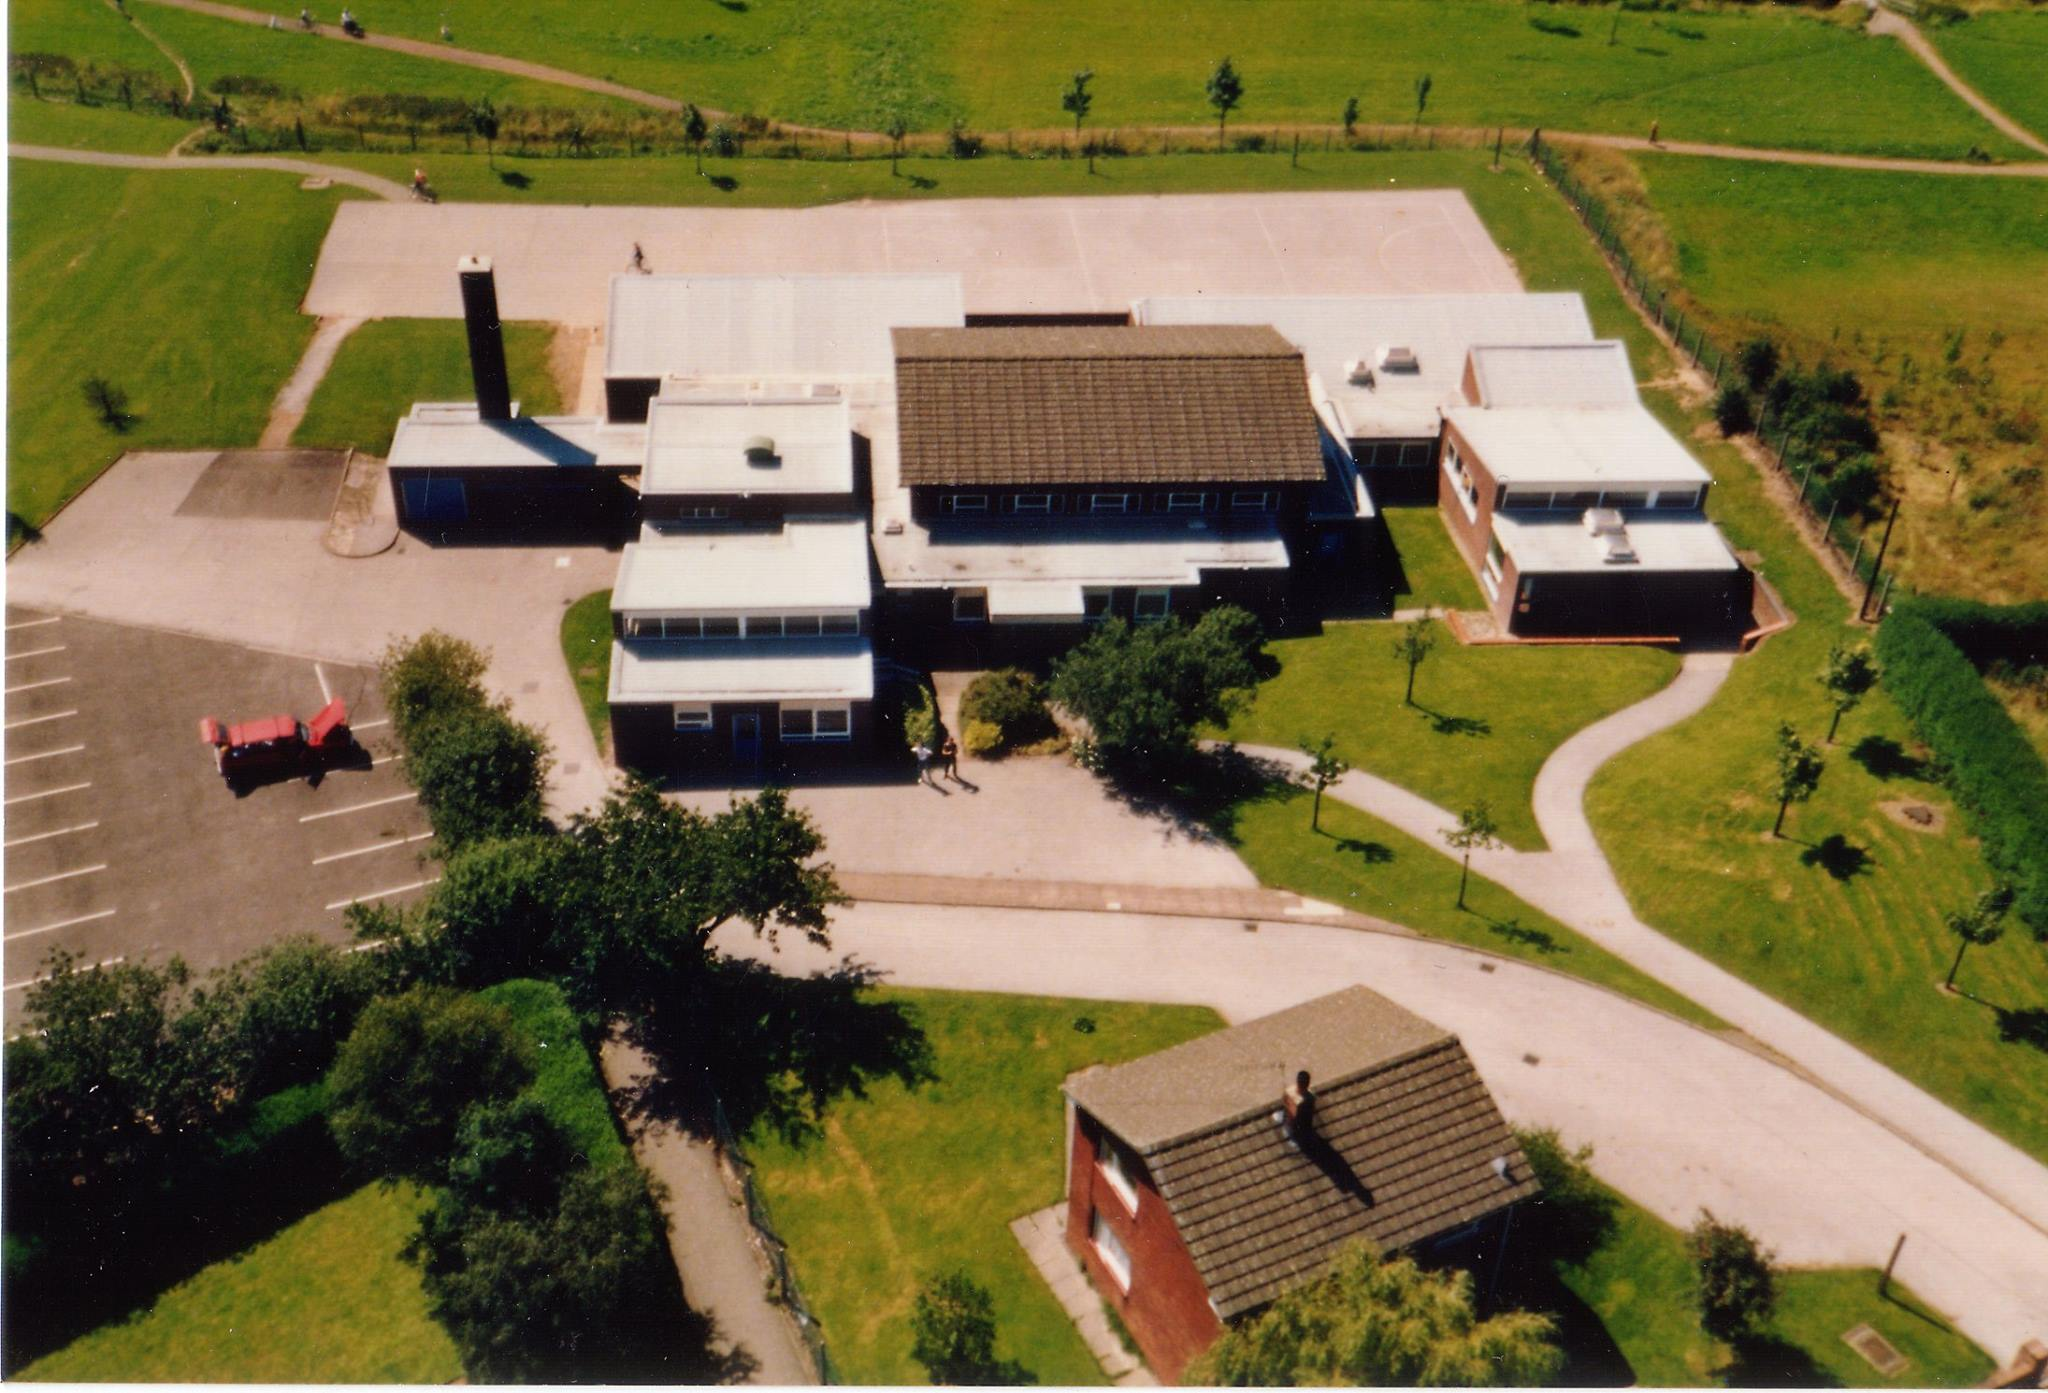 St Mary's Catholic church and school